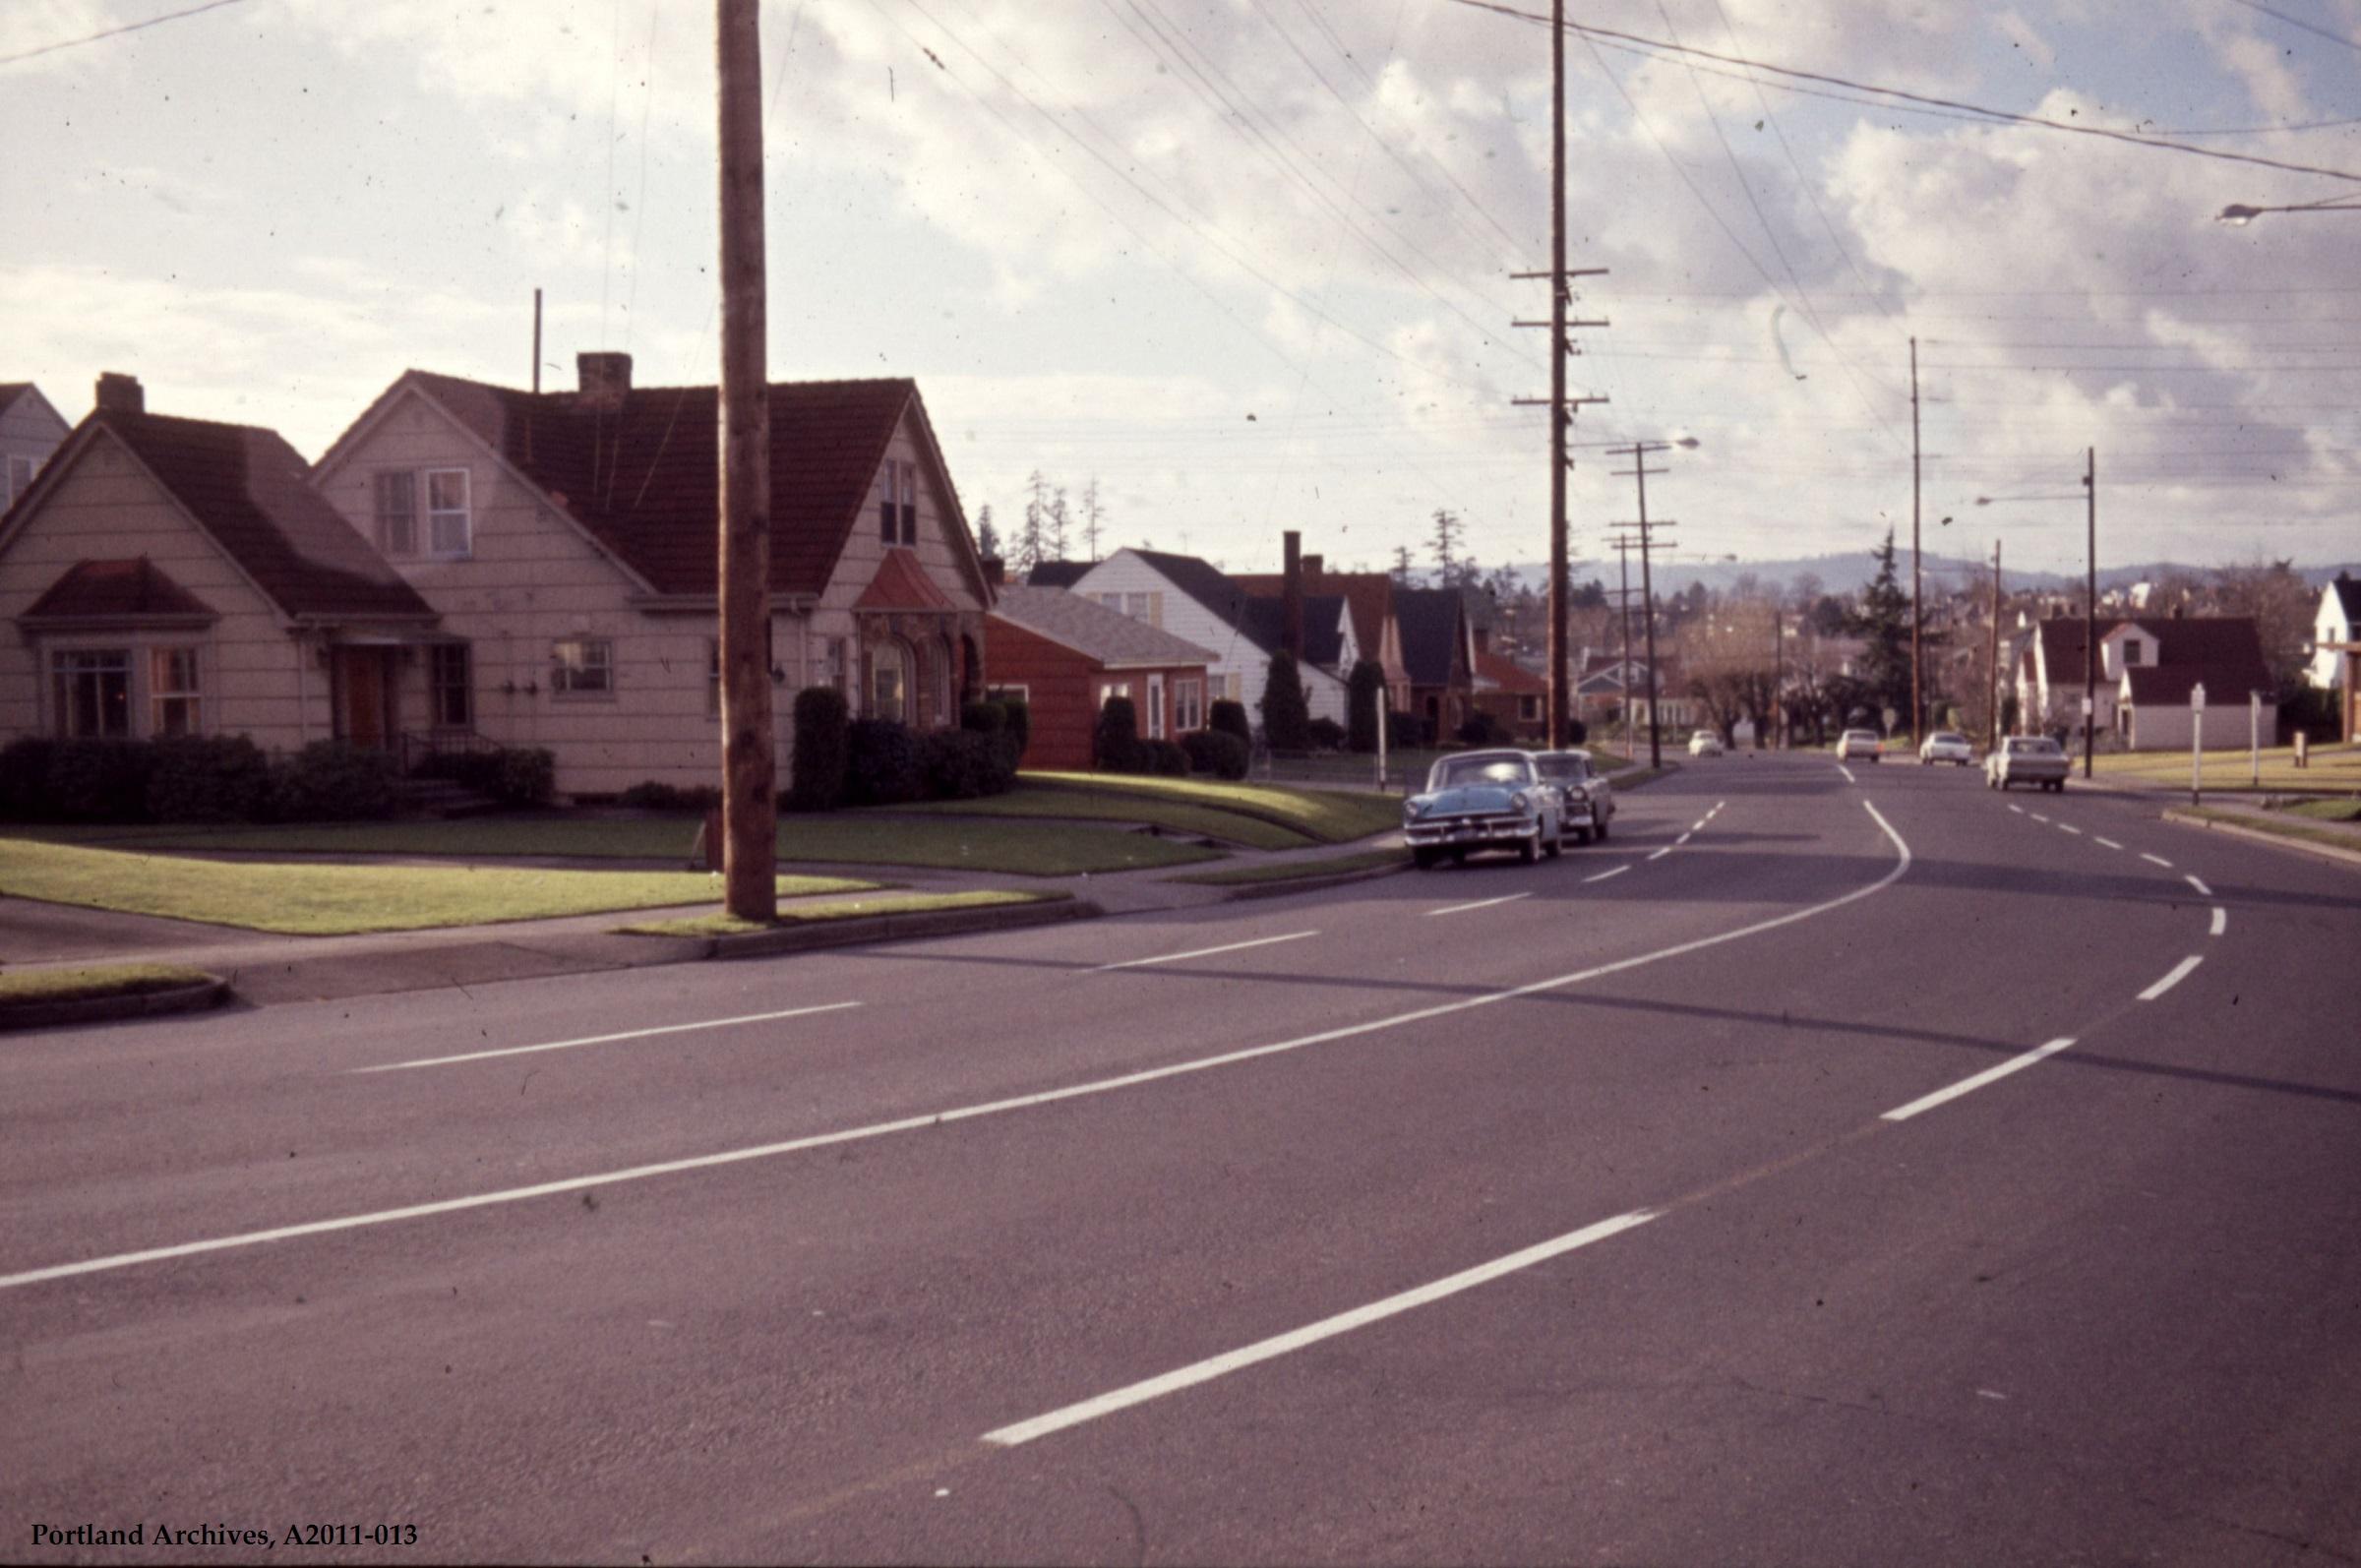 City of Portland Archives, Oregon, SE 45th Avenue near E Burnside Street, A2011-013, 1964